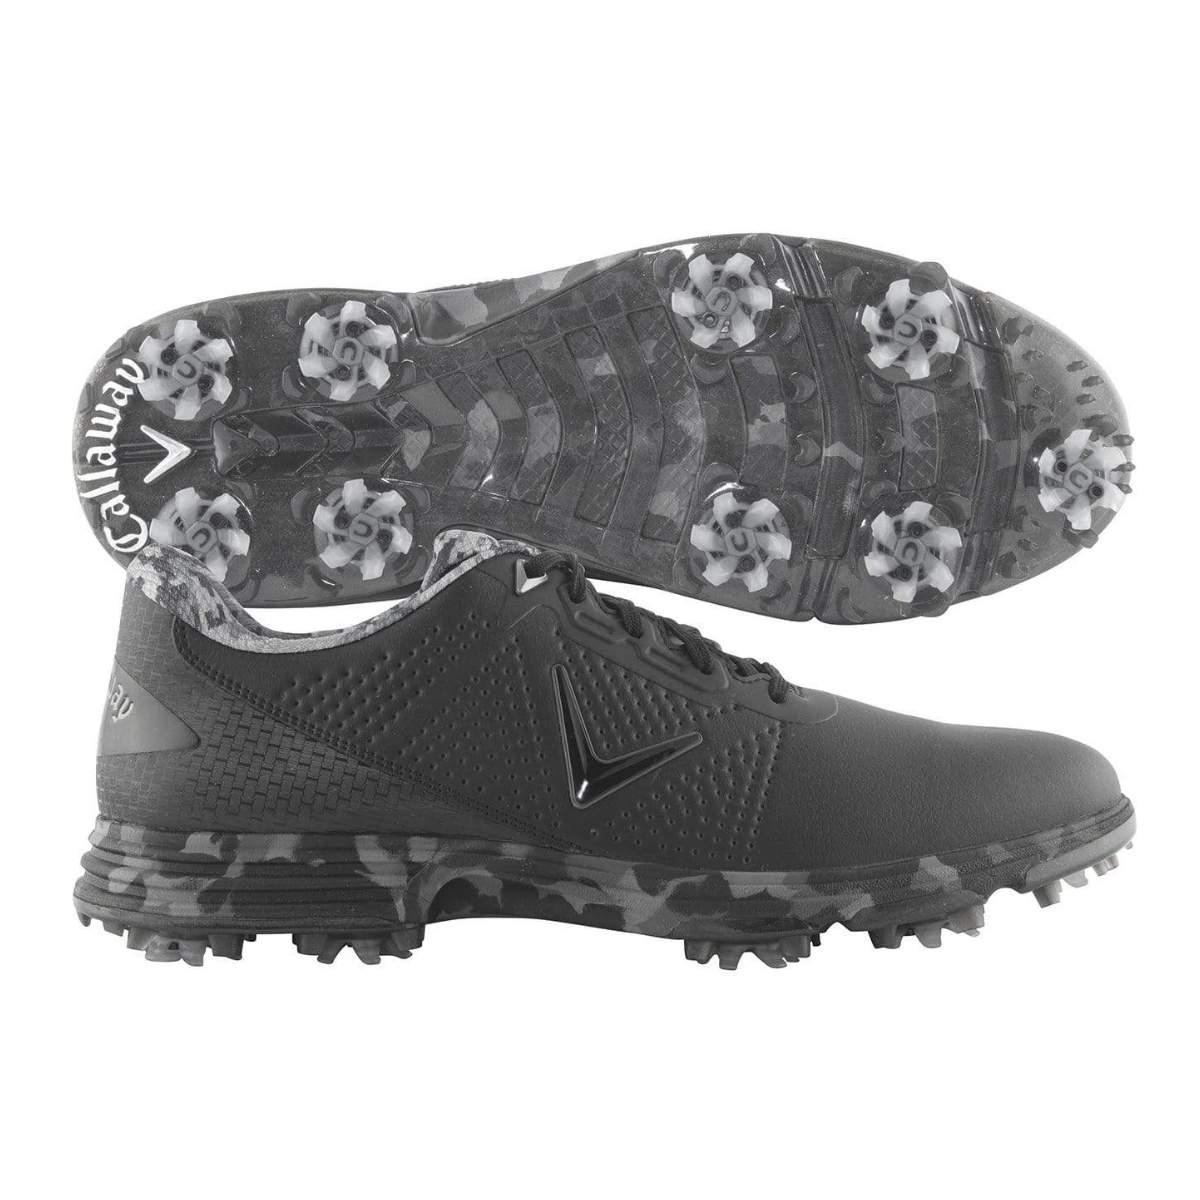 Callaway Men's Coronado Black Golf Shoes